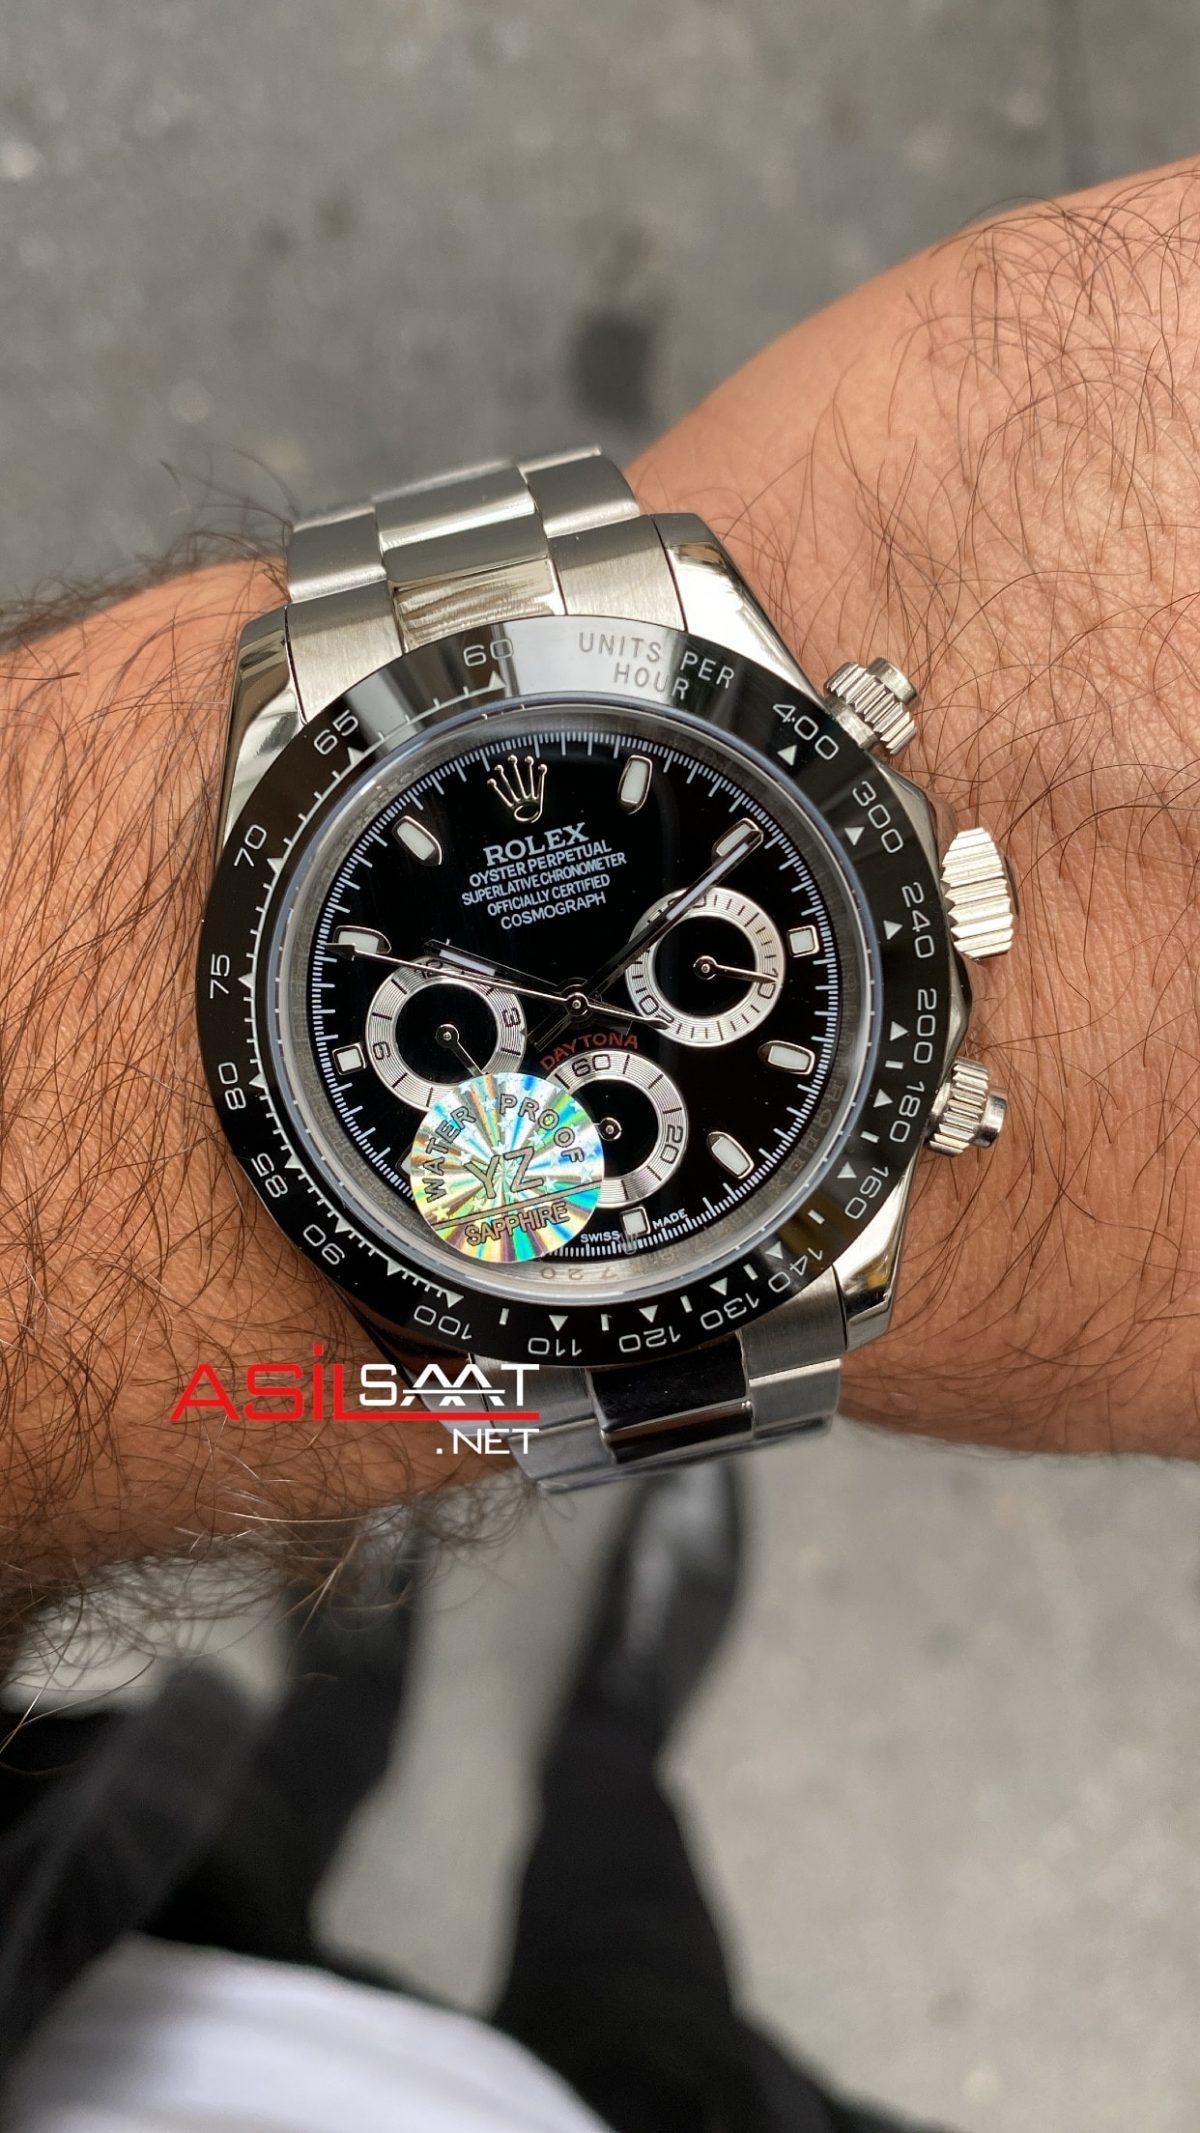 Rolex Daytona Cosmograph 116500 LN Black Dial ROLDA001